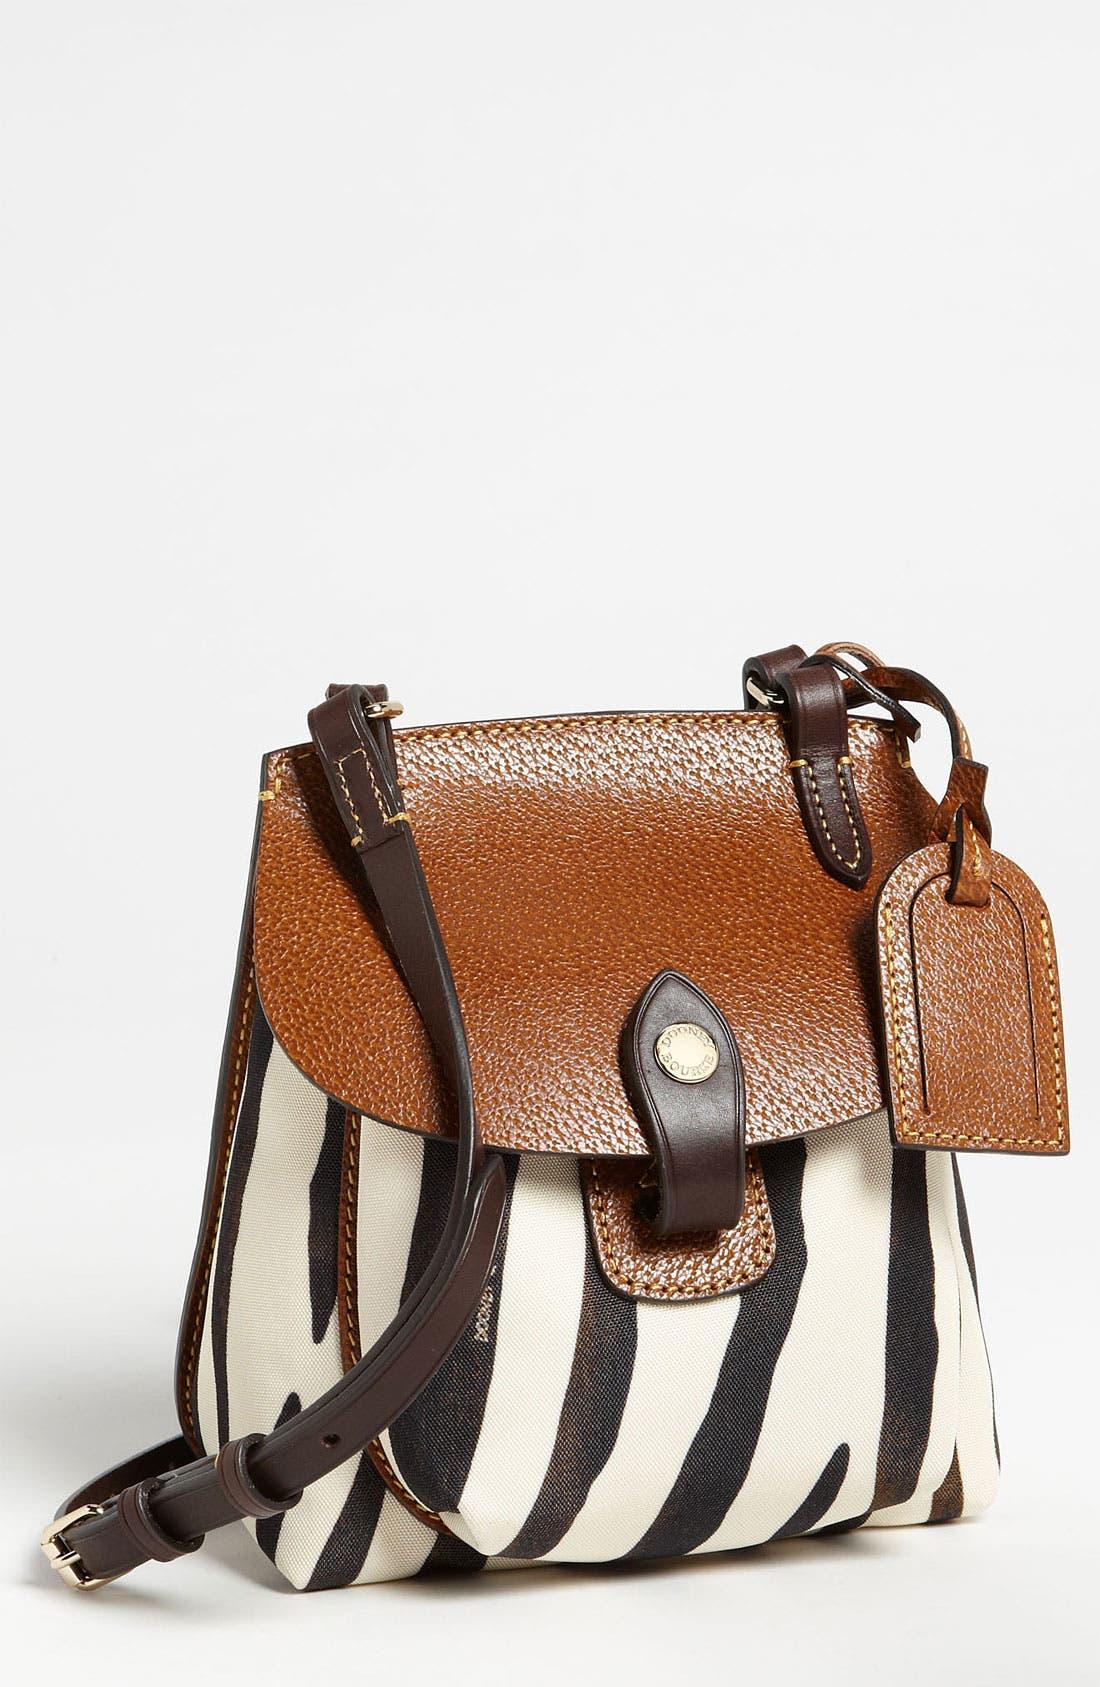 Main Image - Dooney & Bourke 'Pocket - Mini' Crossbody Bag